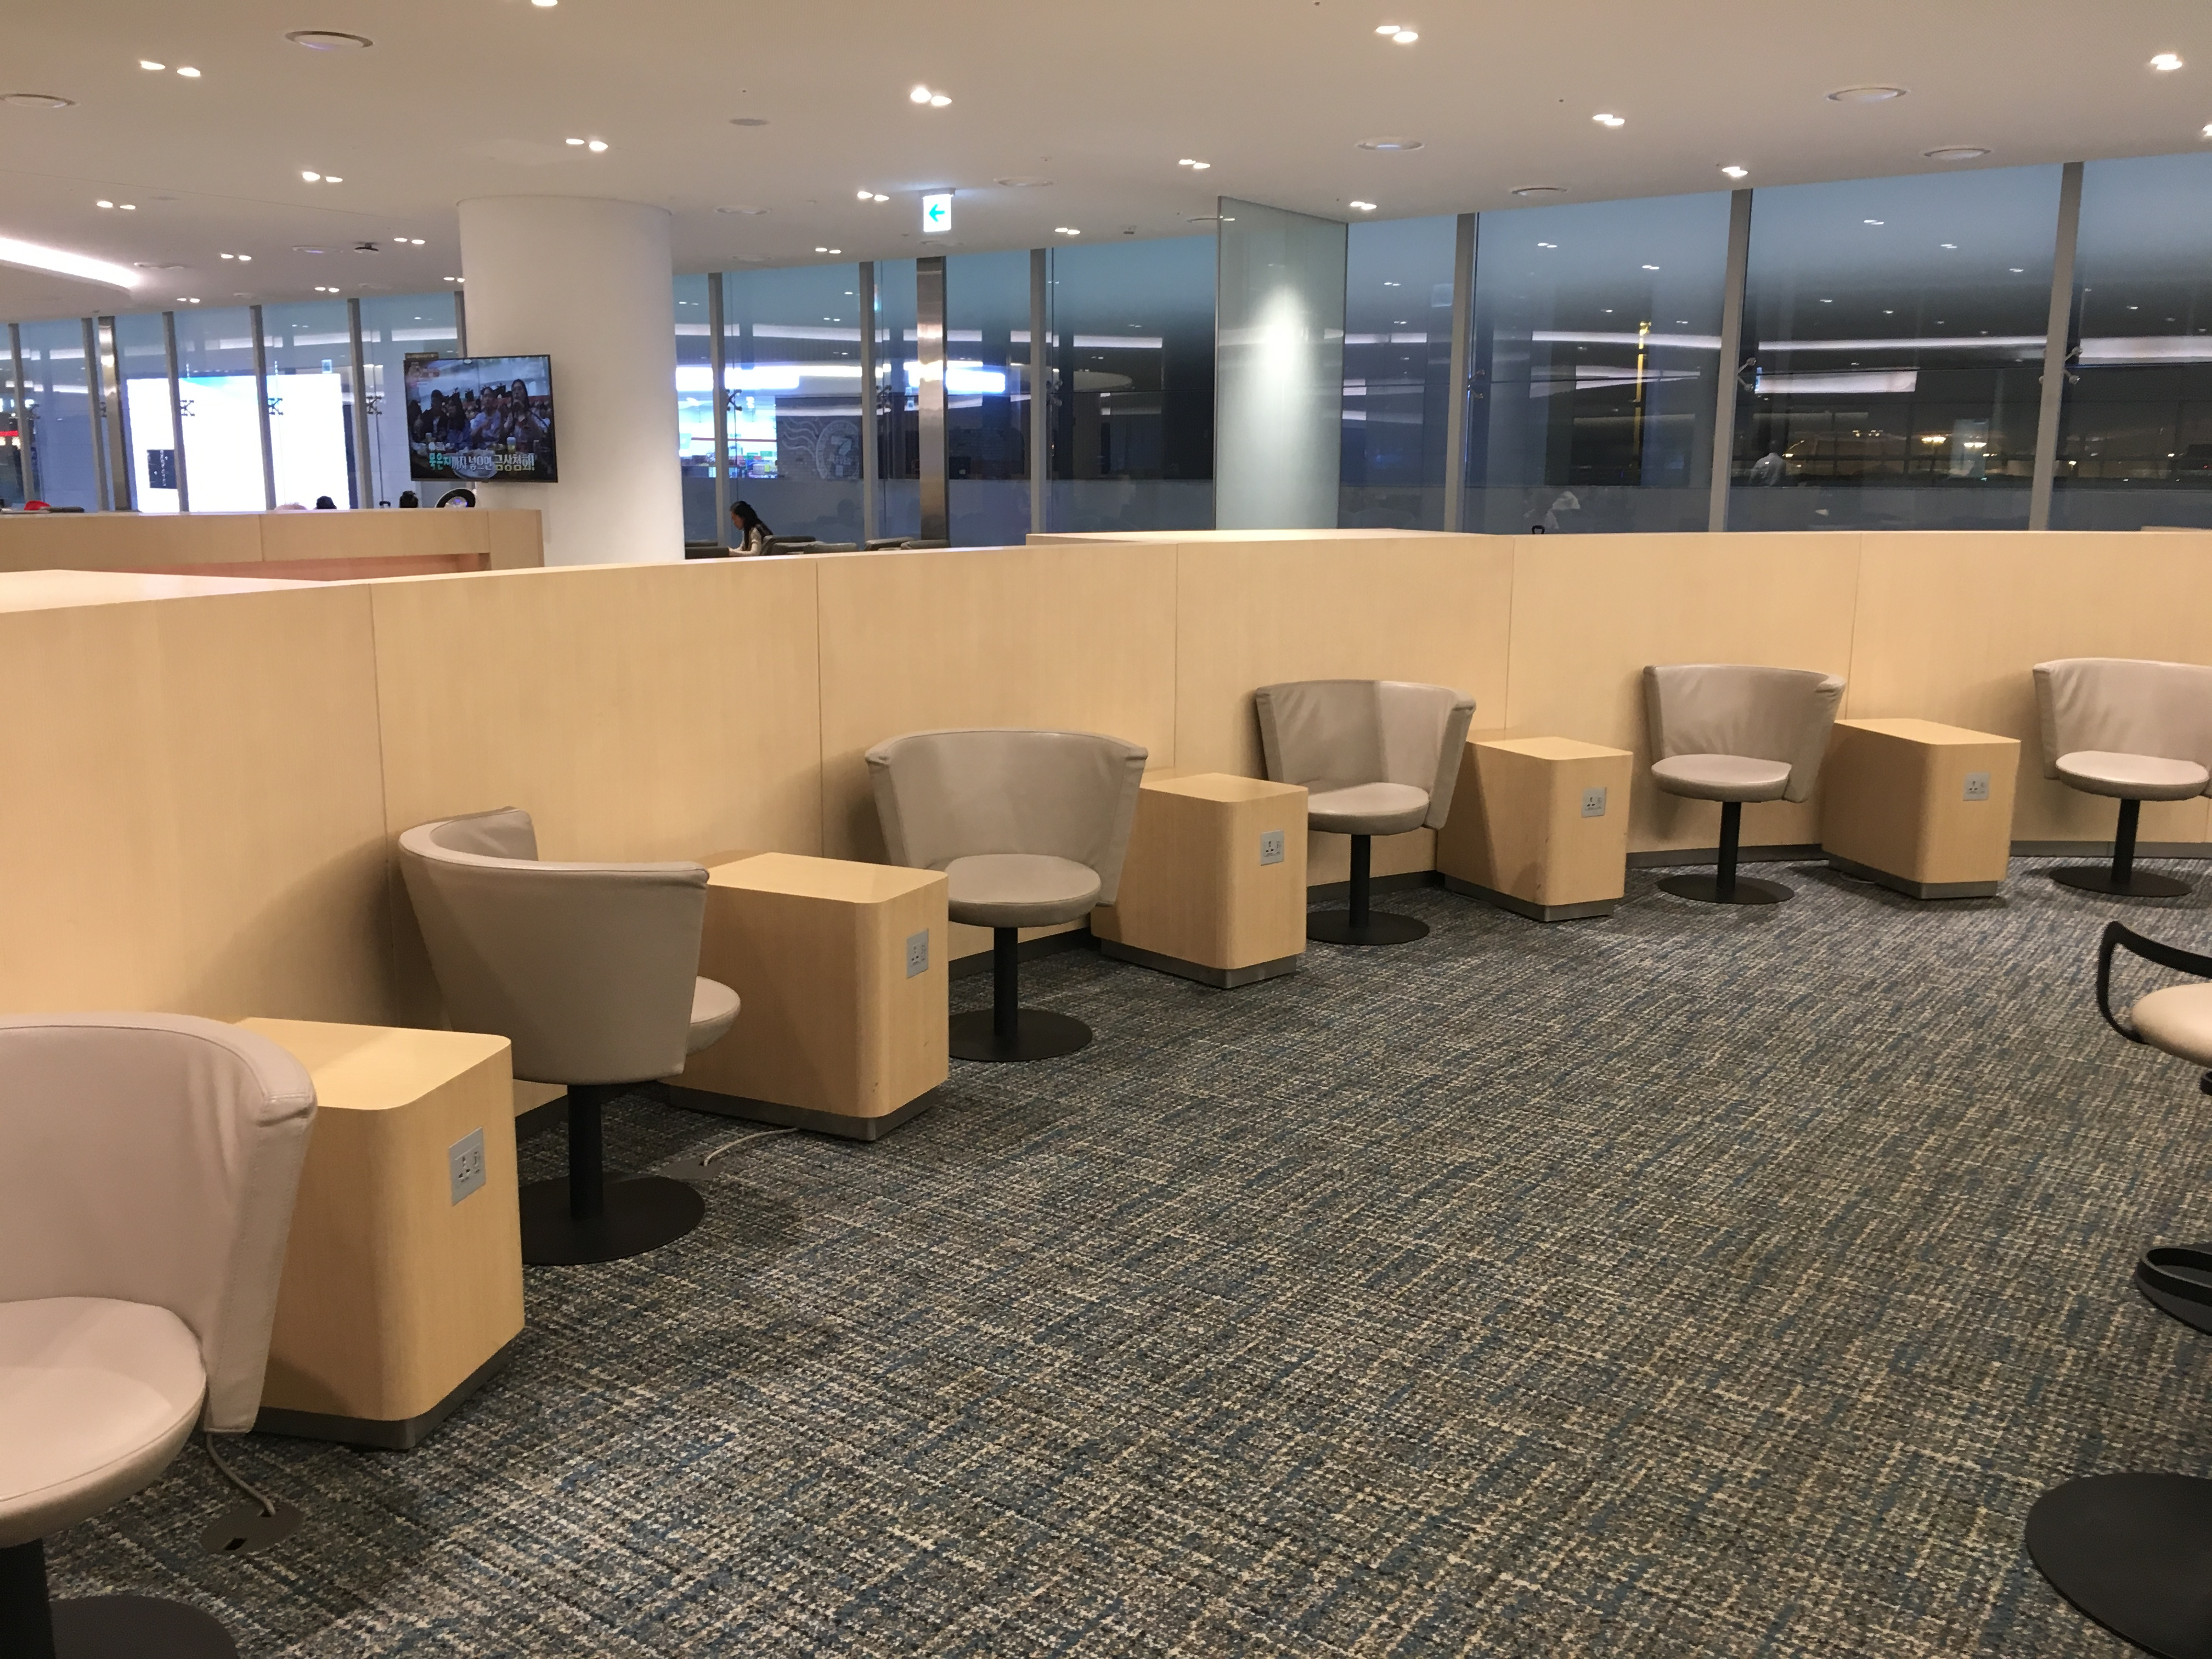 Lounge Review : ソウル仁川空港(ICN)ターミナル2 KALプレステージラウンジ West(KAL Prestige Lounge)